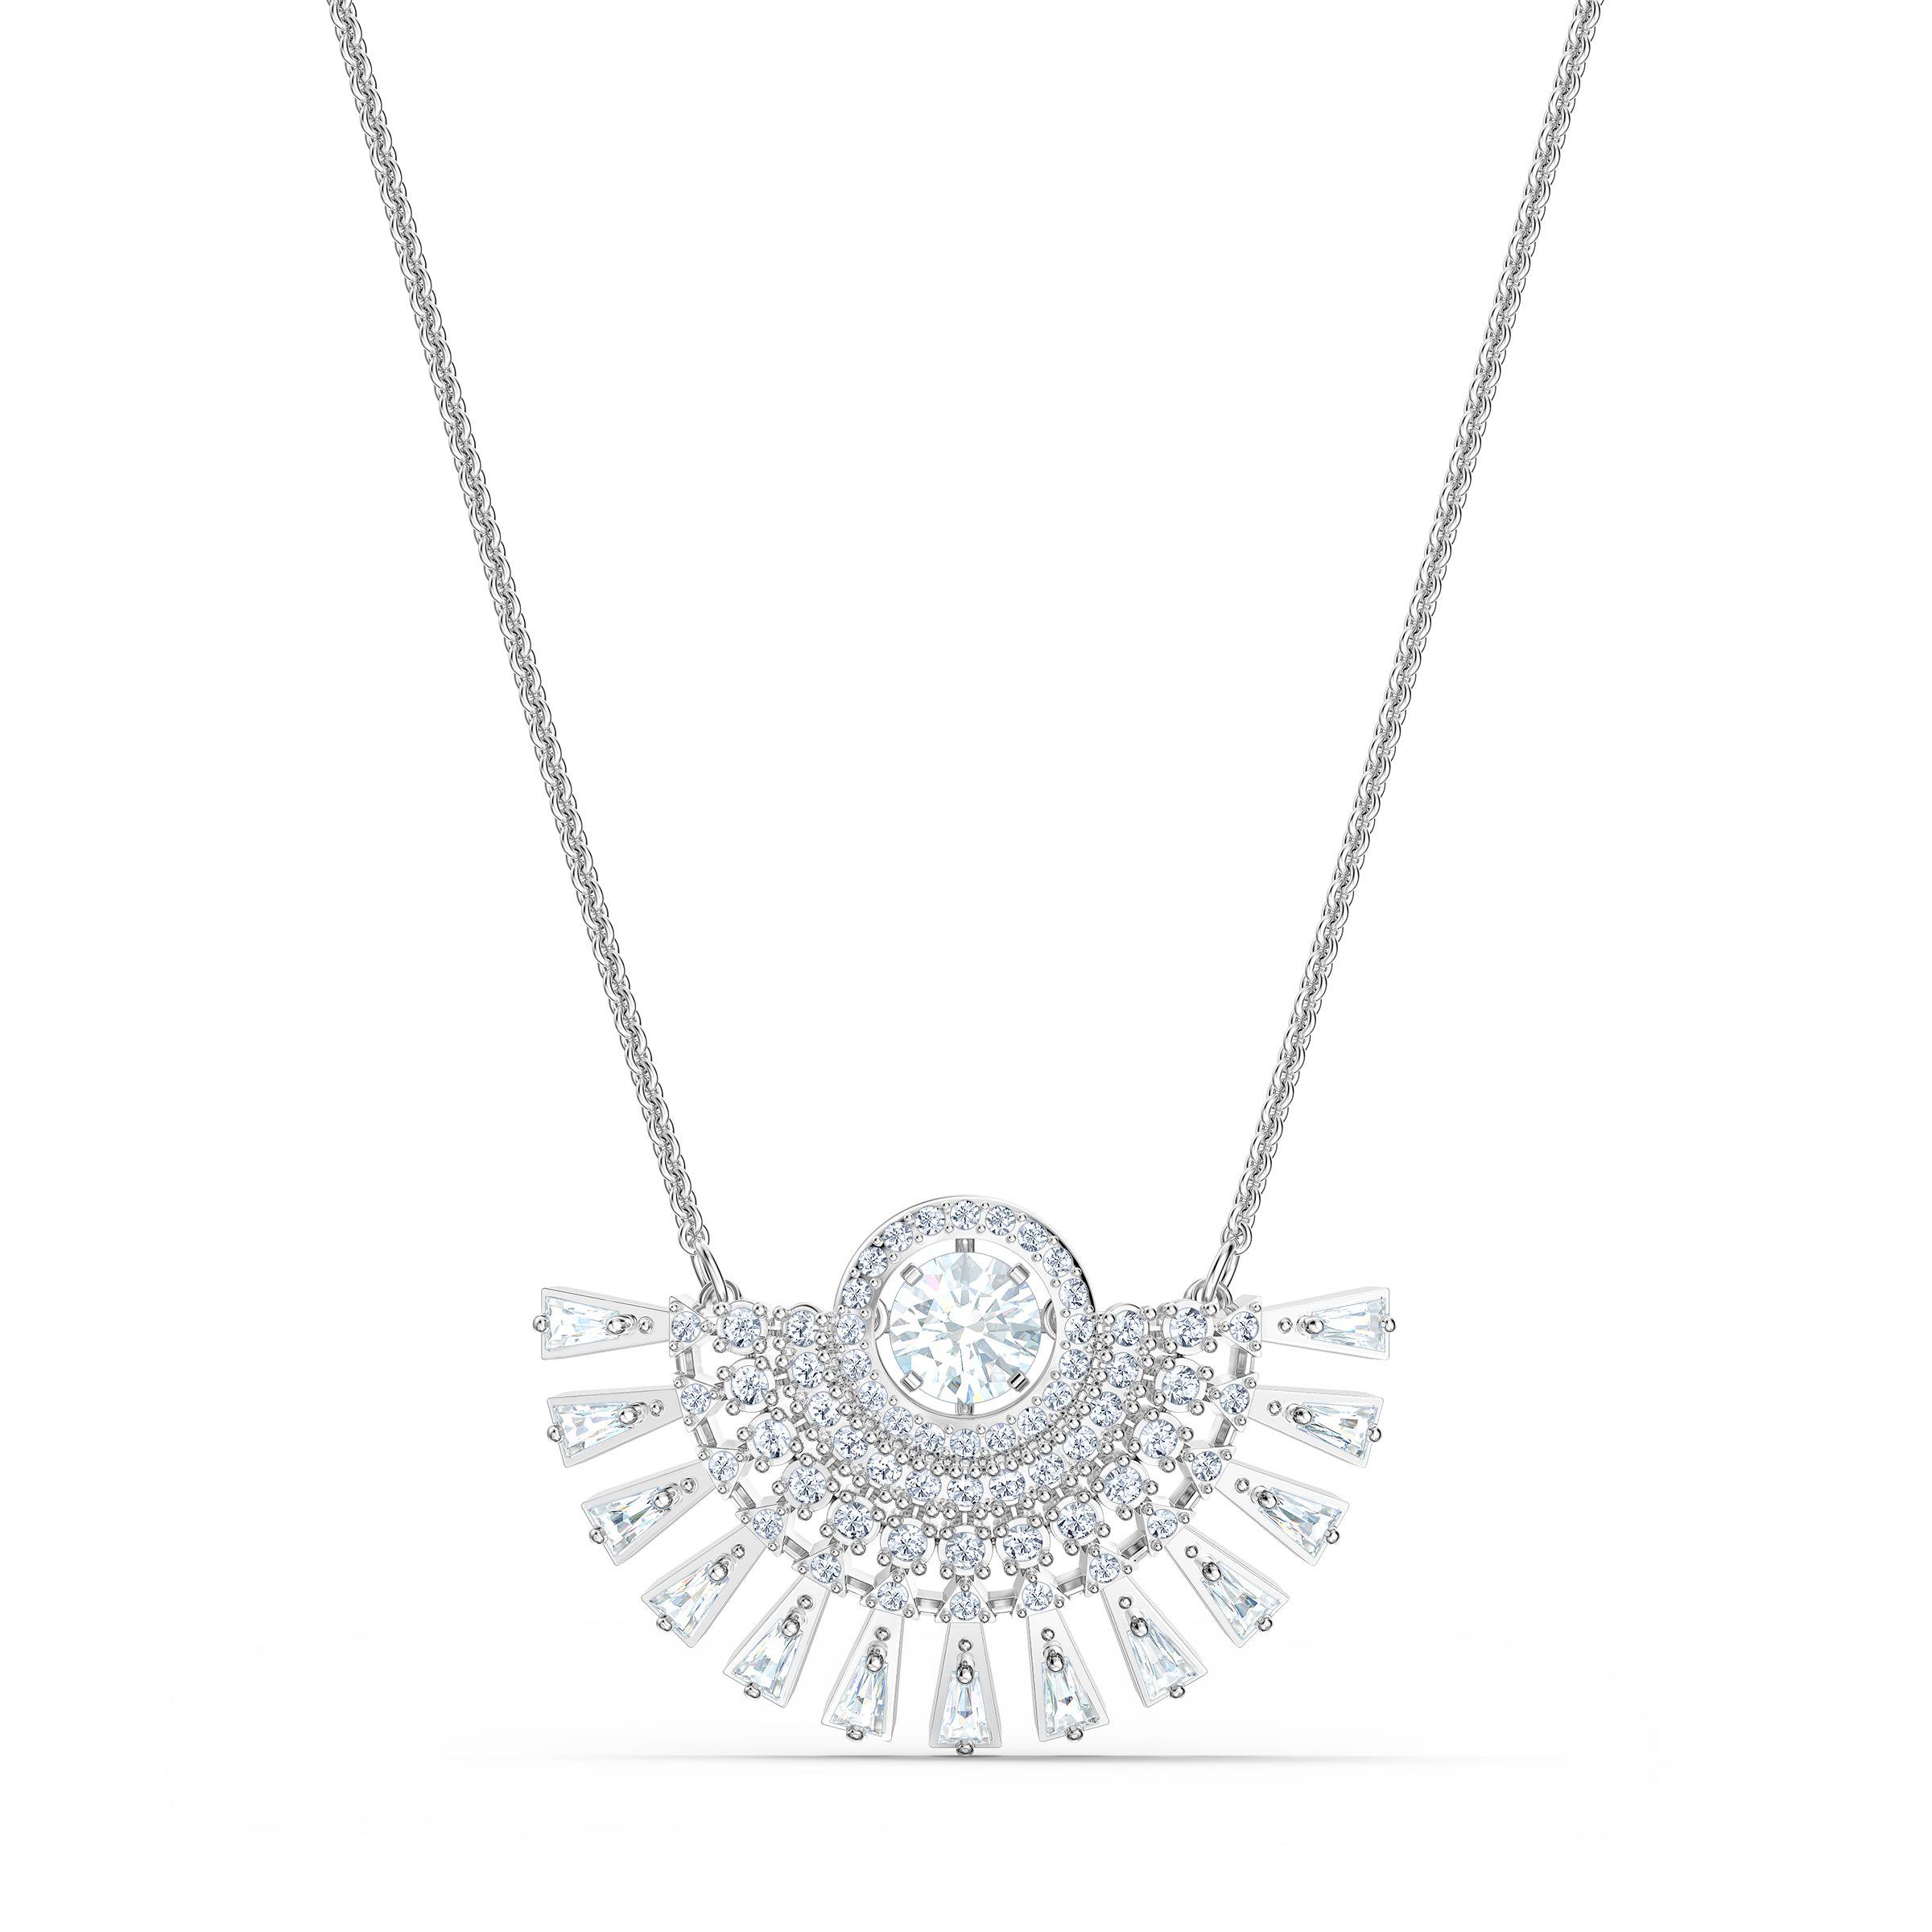 Collier Swarovski Sparkling Dance Dial Up, medium, blanc, métal rhodié, Swarovski